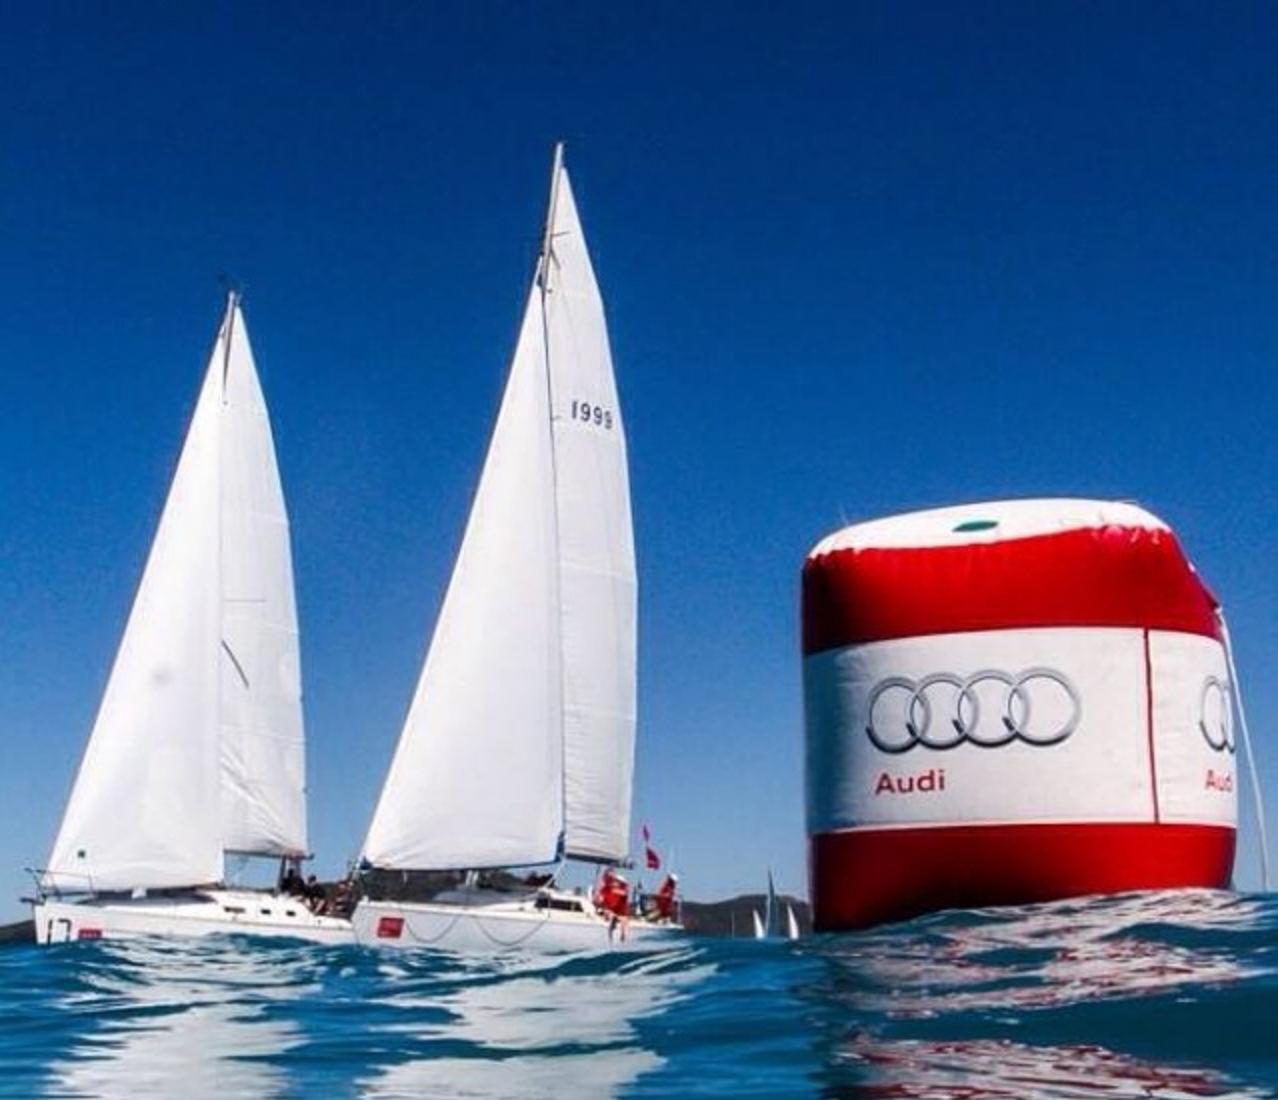 Charter Yachts Australia Hamilton Island Race Week